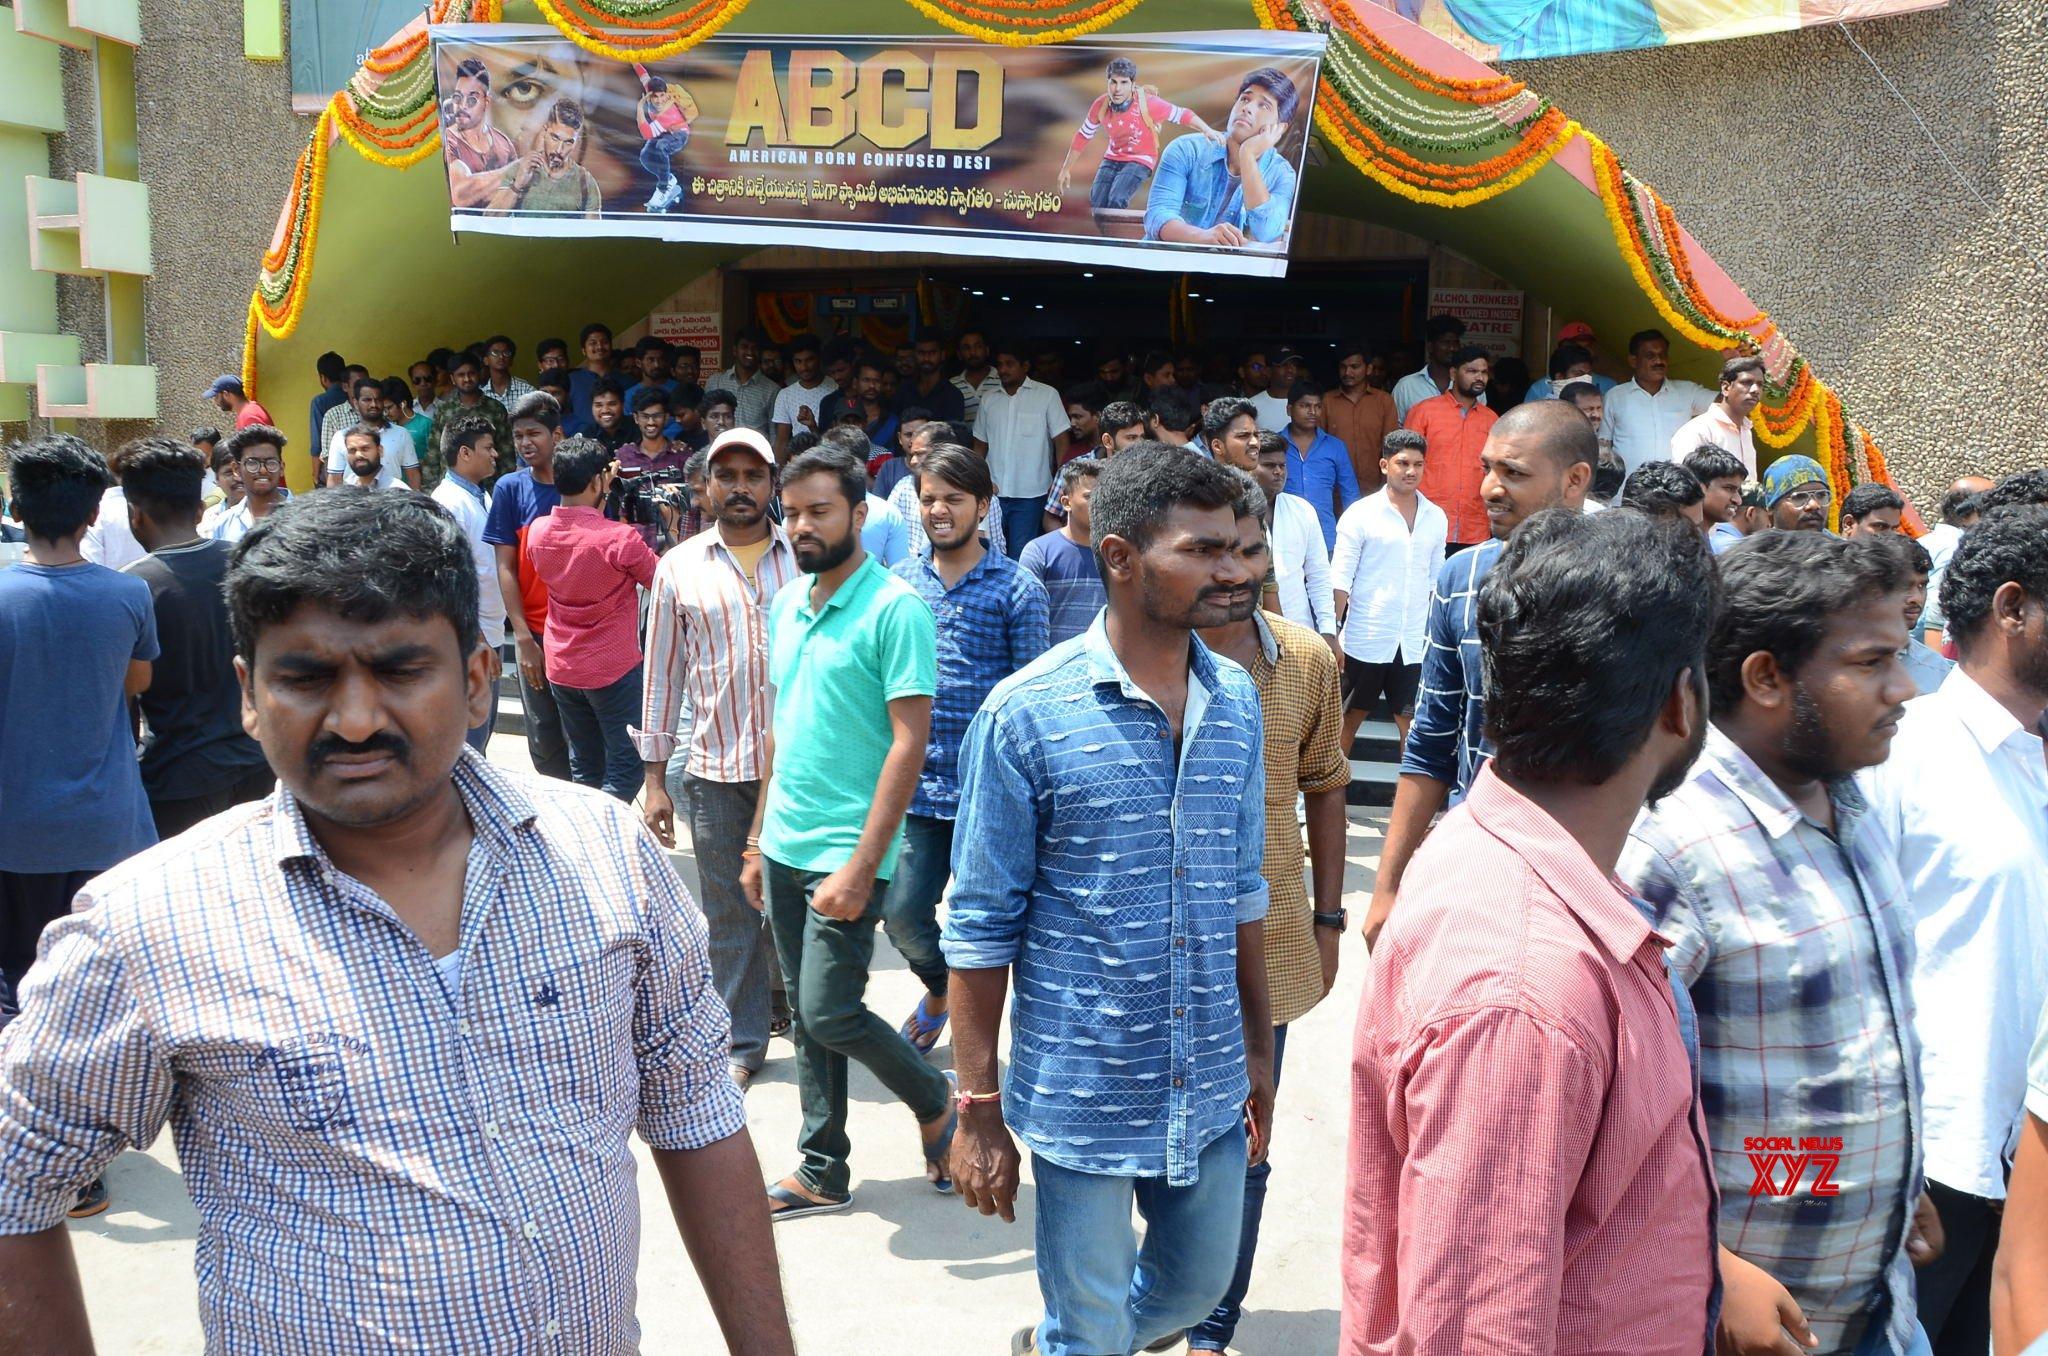 Allu Sirish Stills From Shanti Theater Visit With ABCD Movie Team